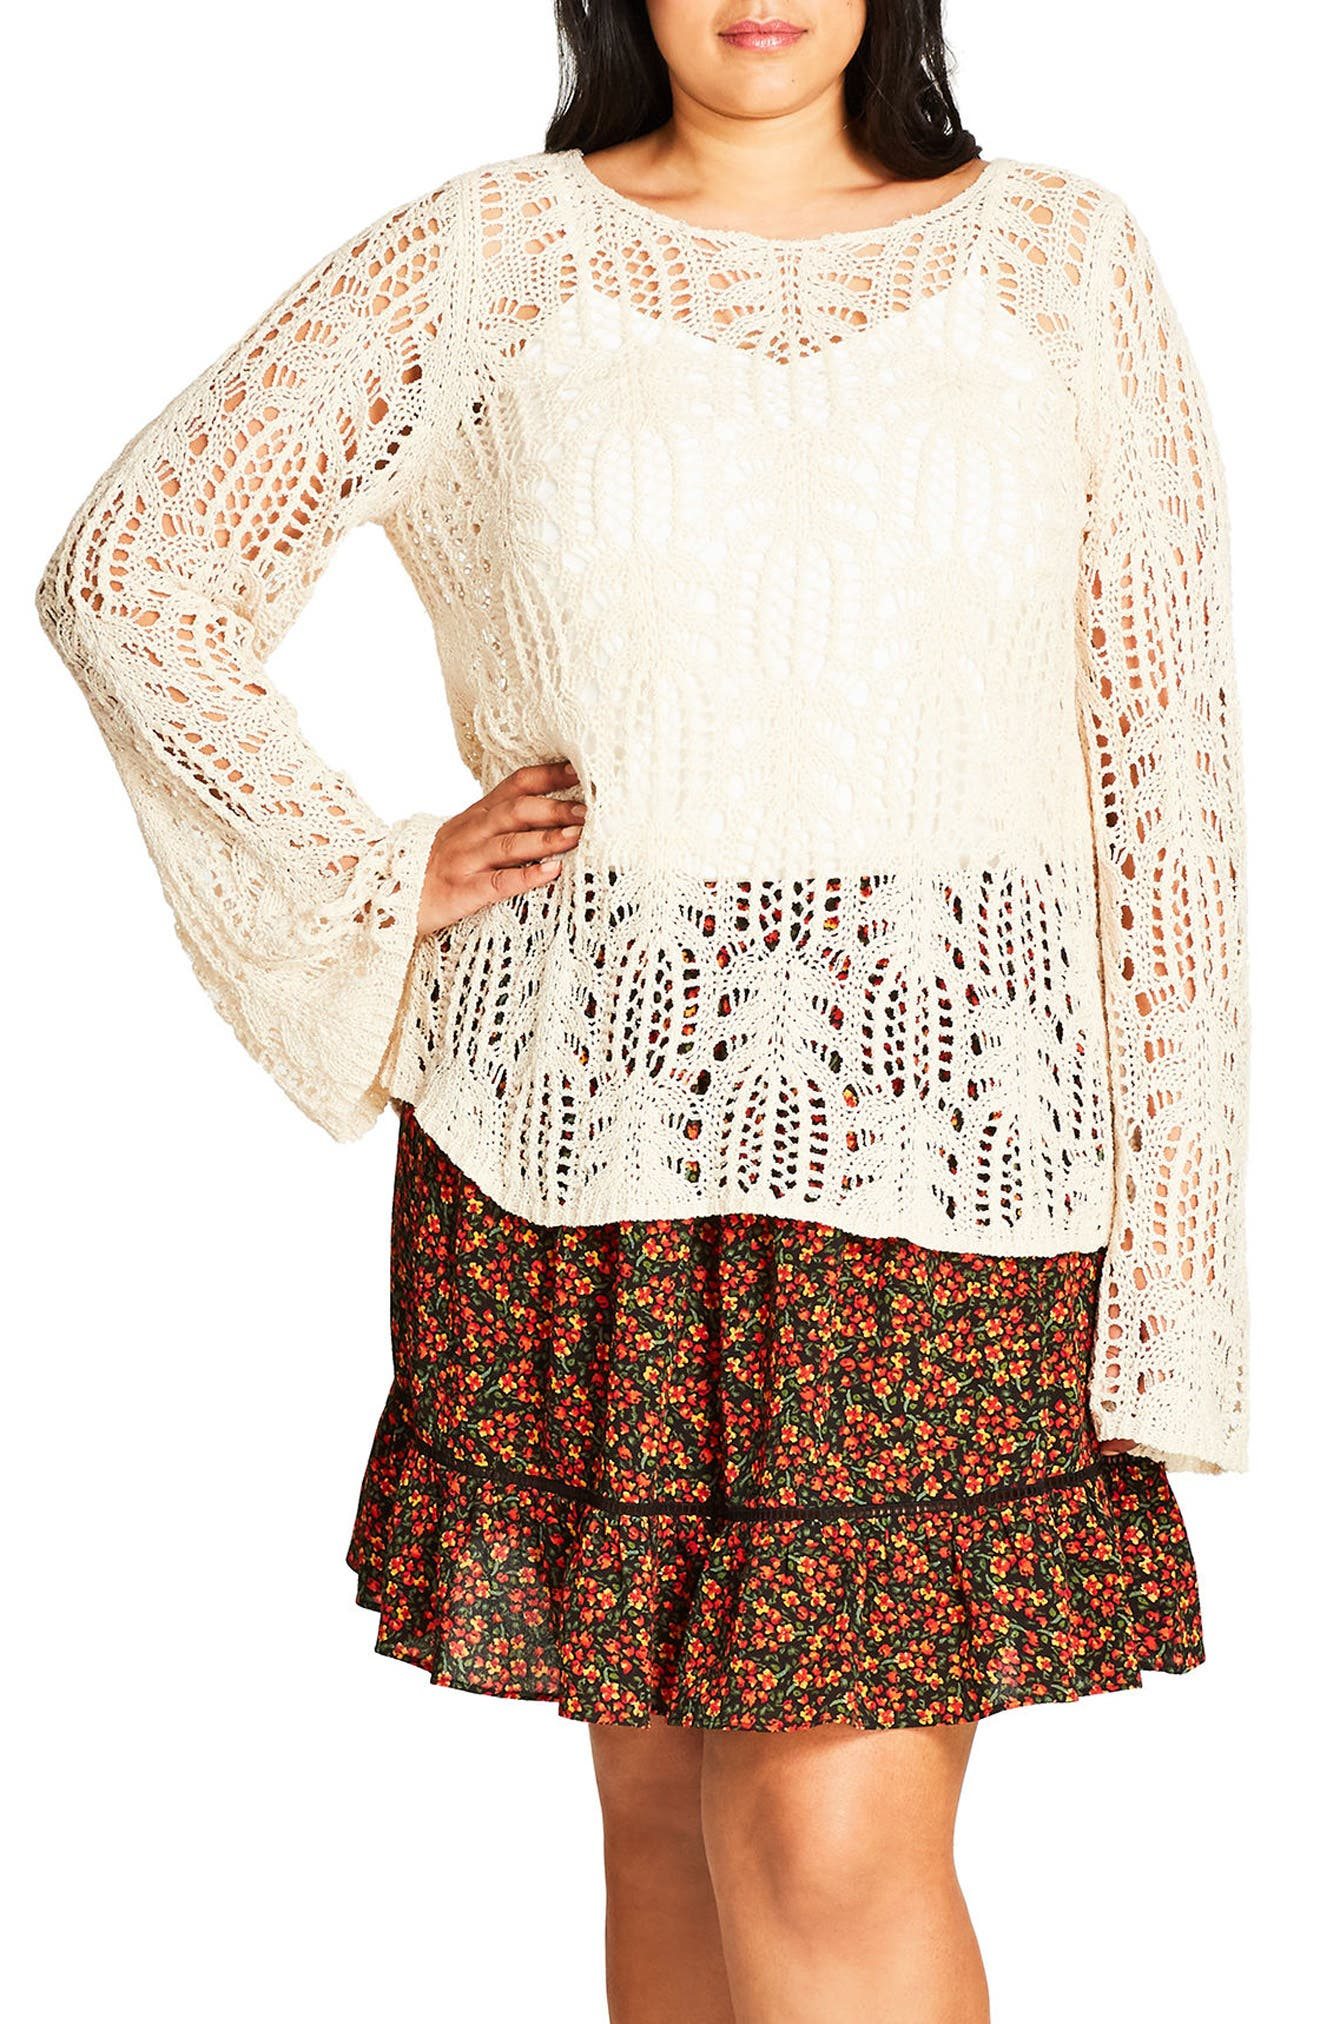 So Delicate Crochet Sweater,                             Main thumbnail 1, color,                             230